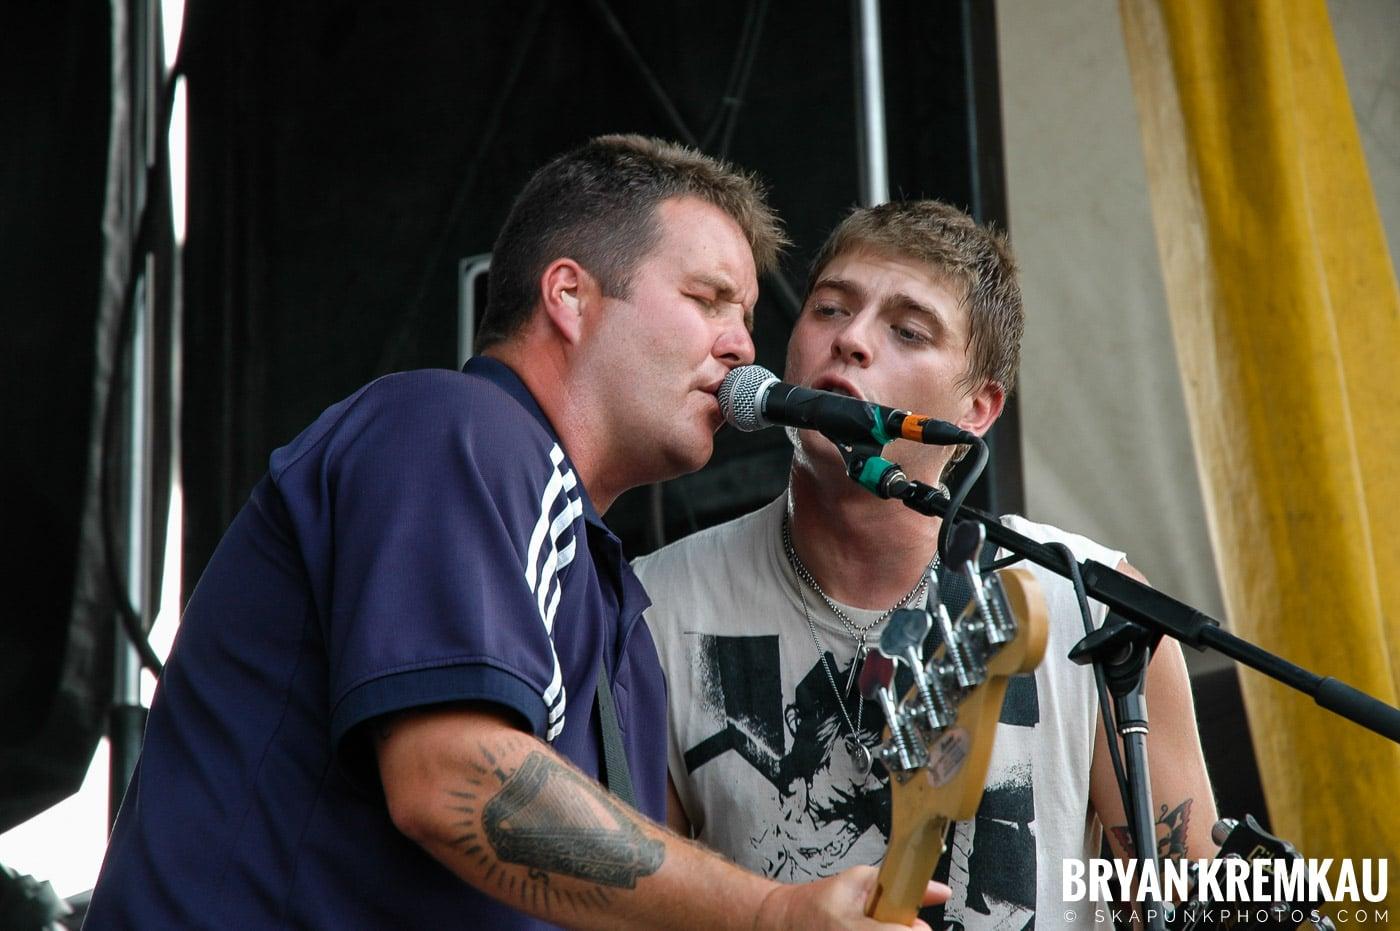 Dropkick Murphys @ Warped Tour 05, NYC - 8.12.05 (5)